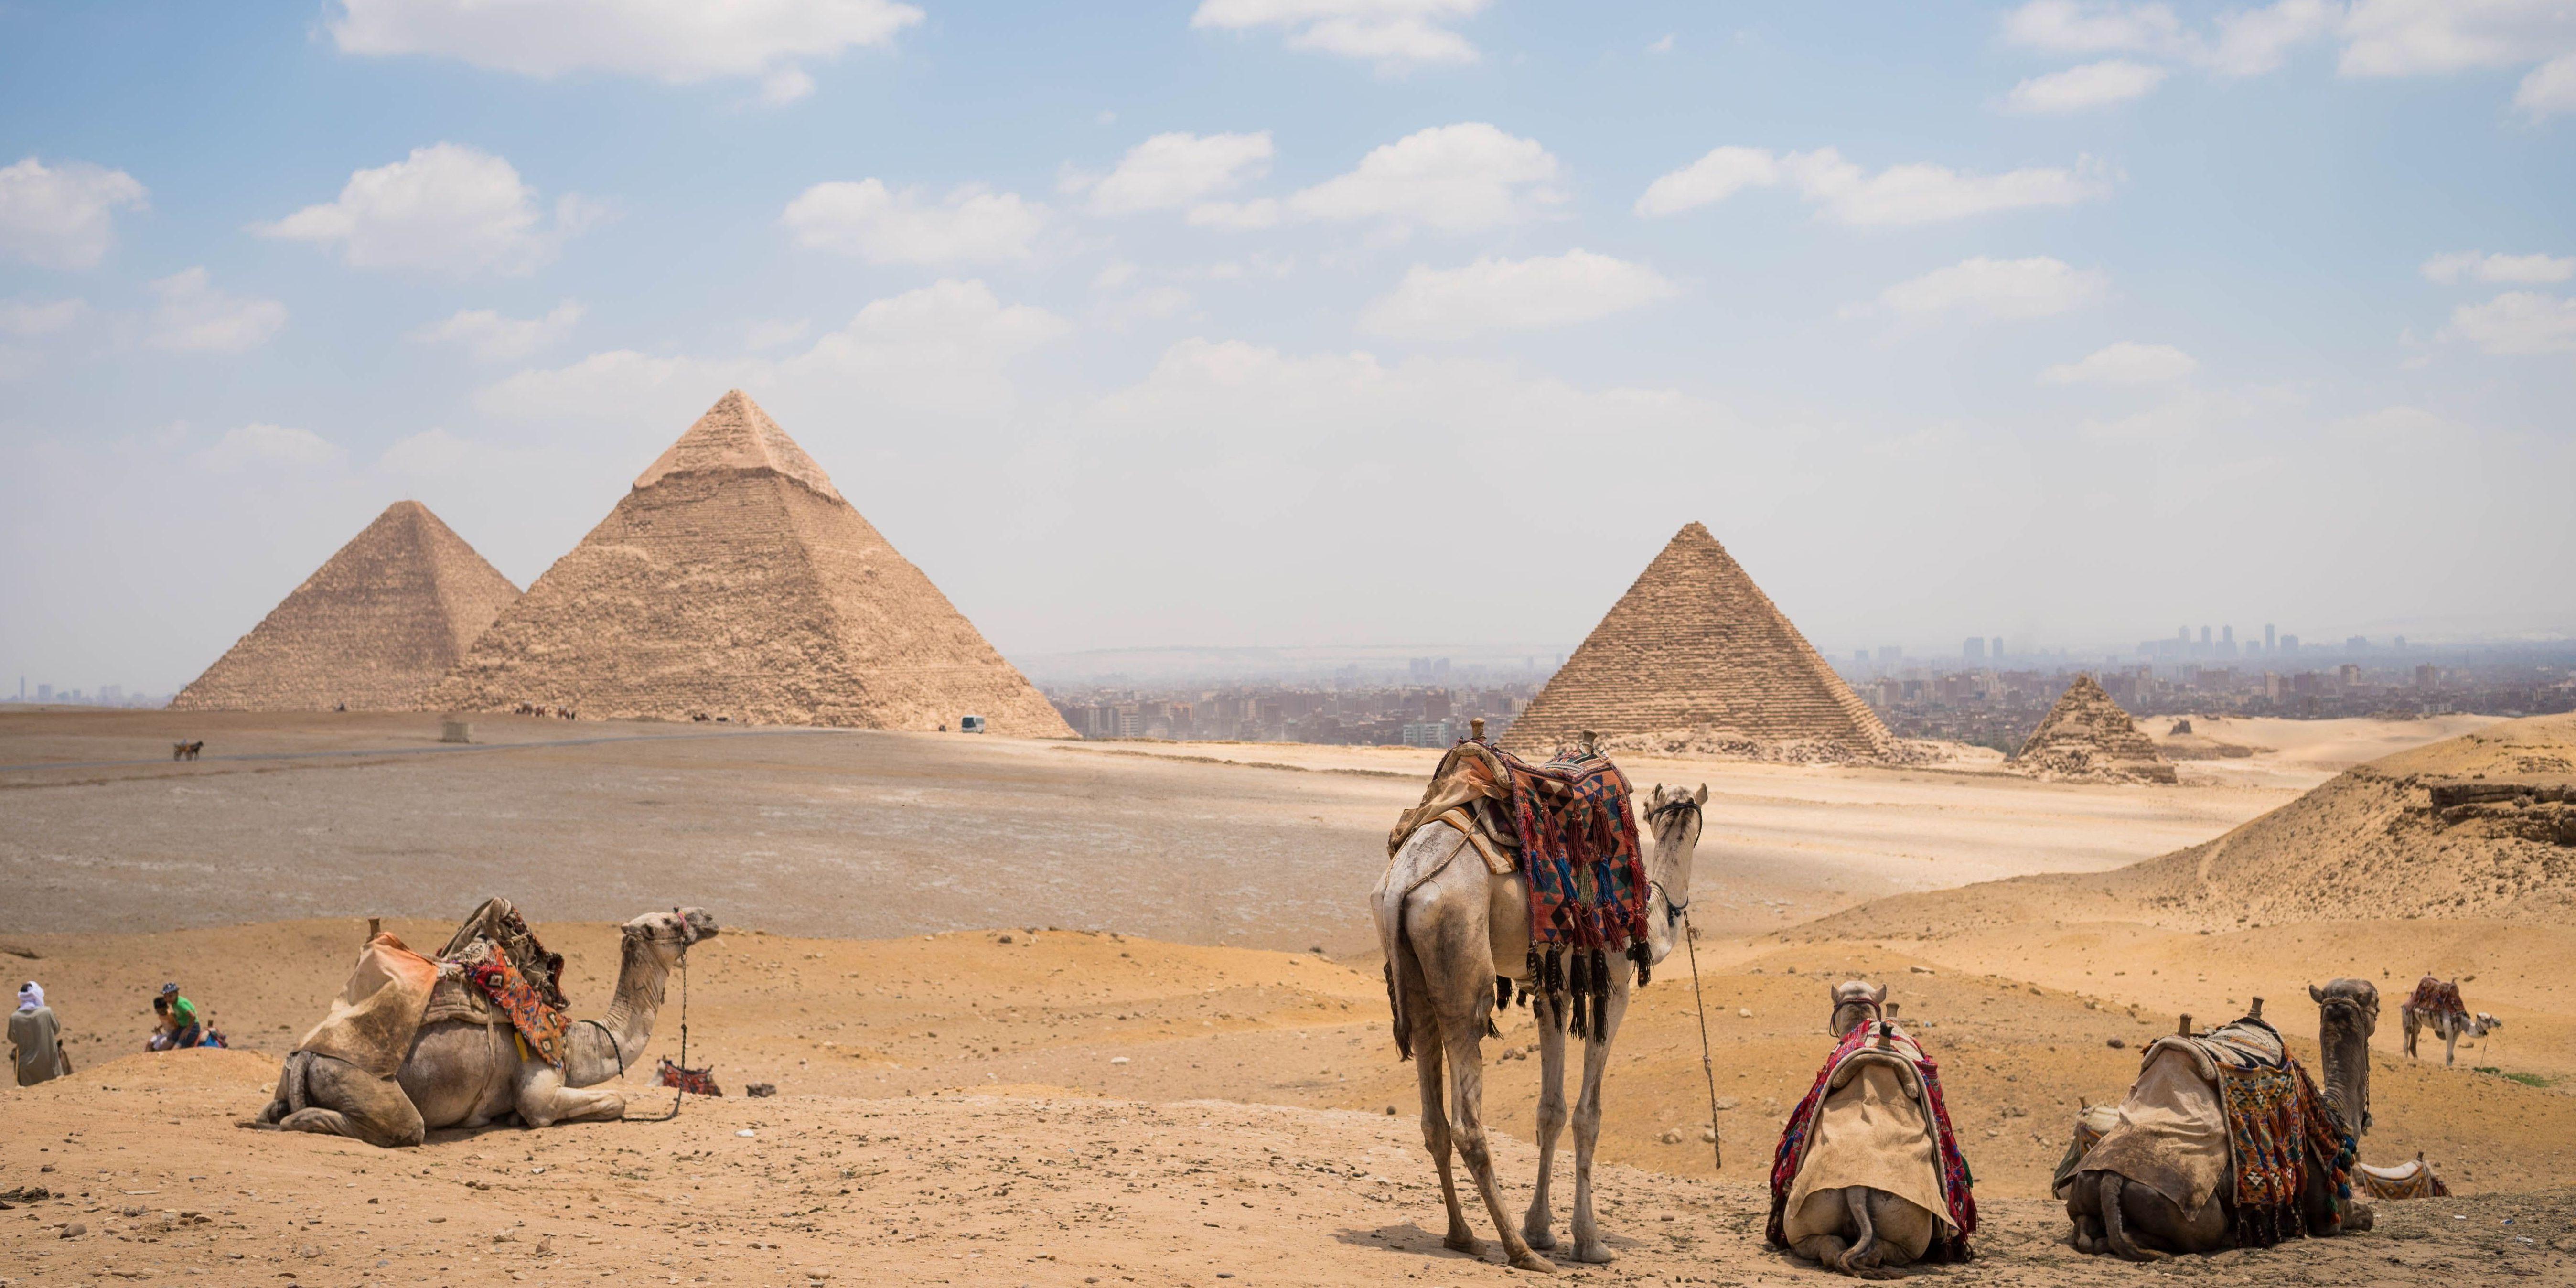 Permalink to: Giza